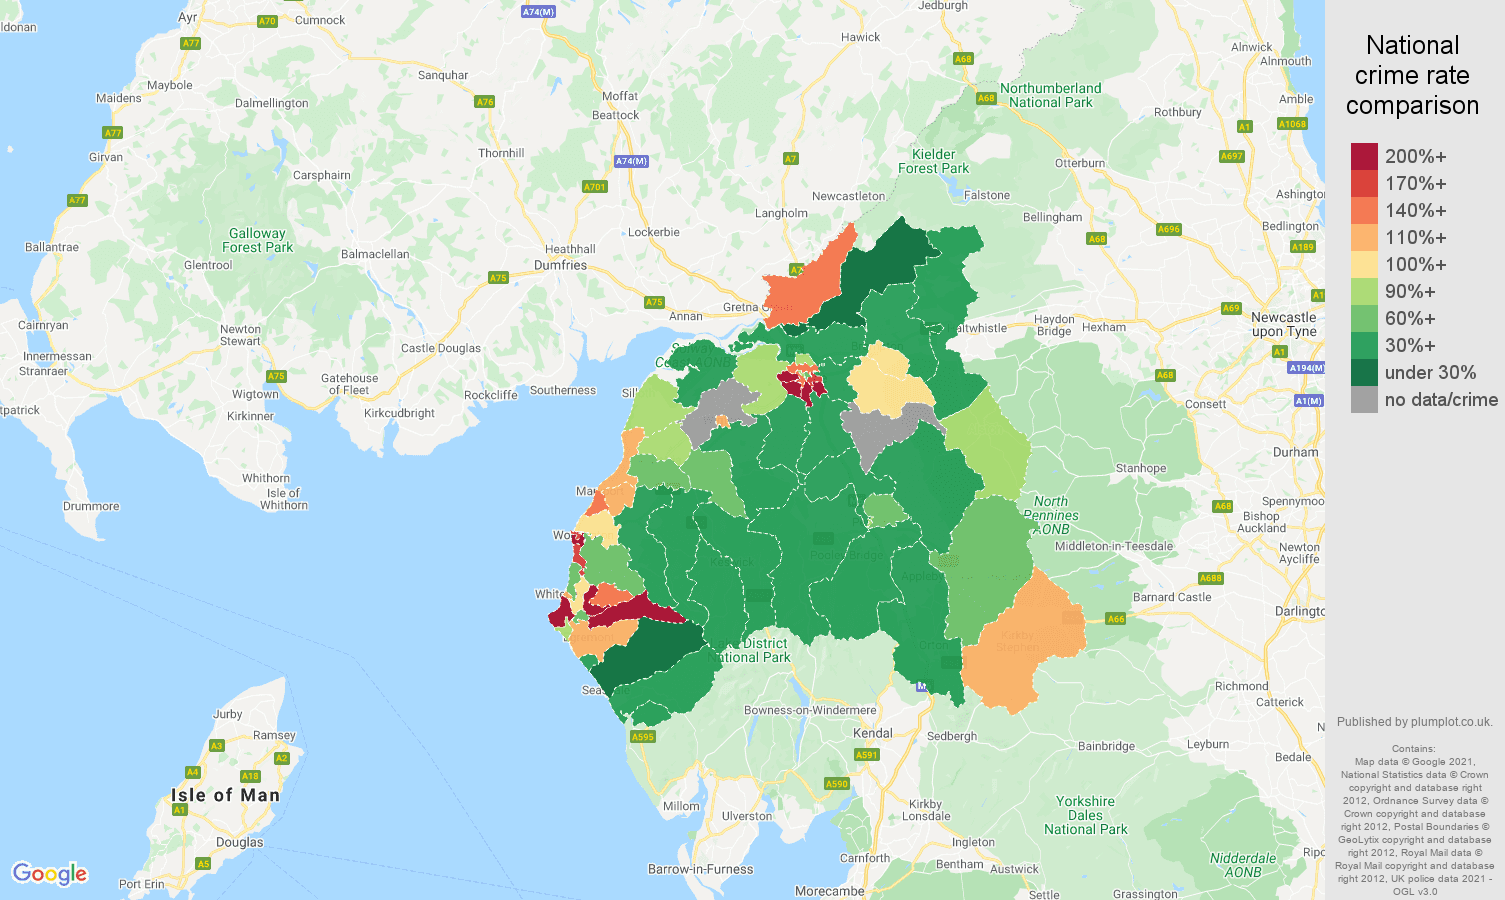 Carlisle criminal damage and arson crime rate comparison map